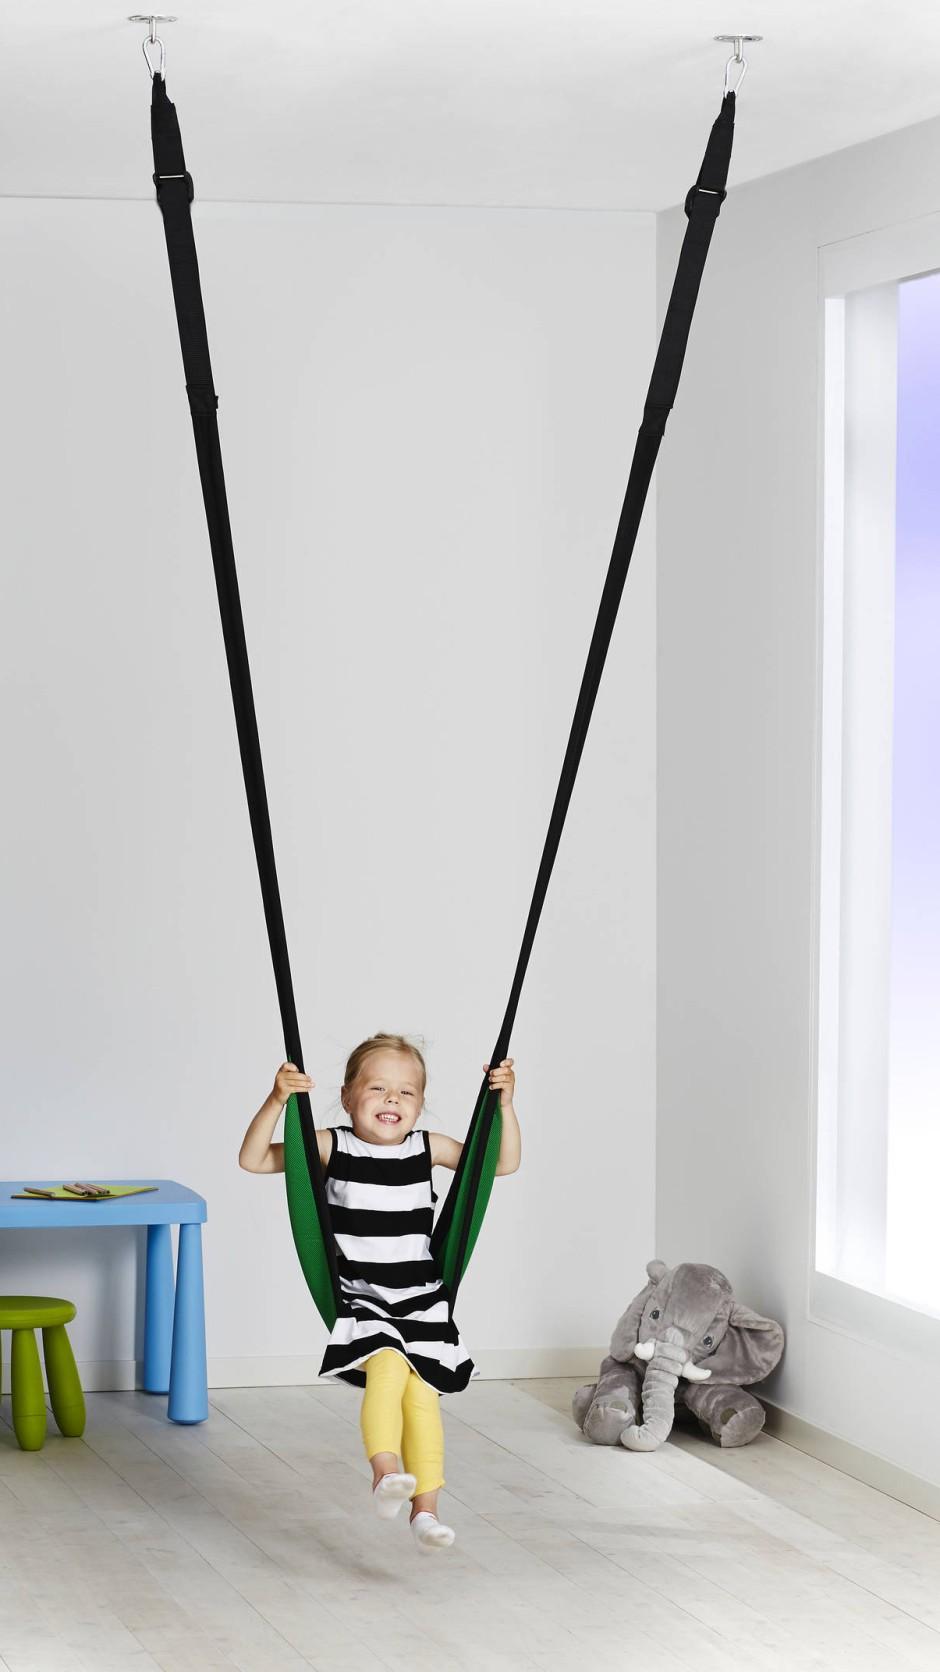 verletzungsgefahr ikea ruft kinderschaukel gunggung. Black Bedroom Furniture Sets. Home Design Ideas